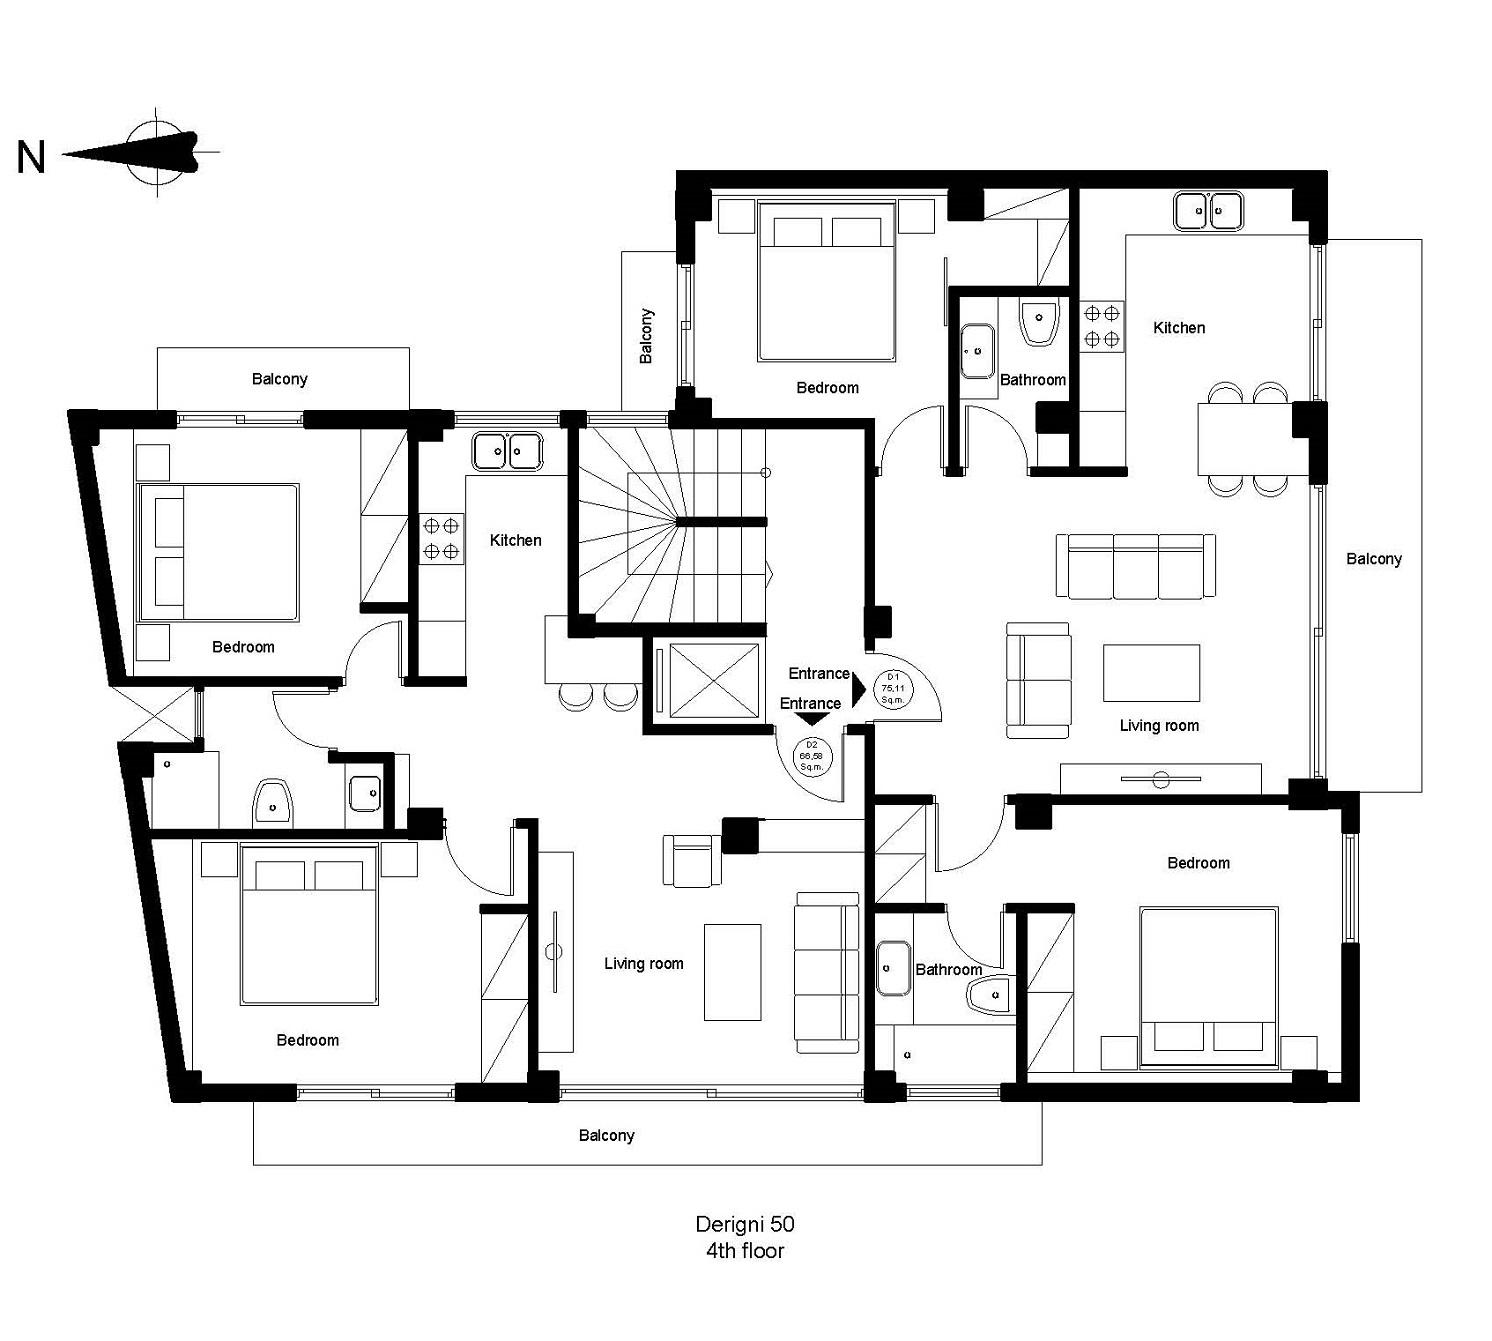 Derigni 50 4th floor plan